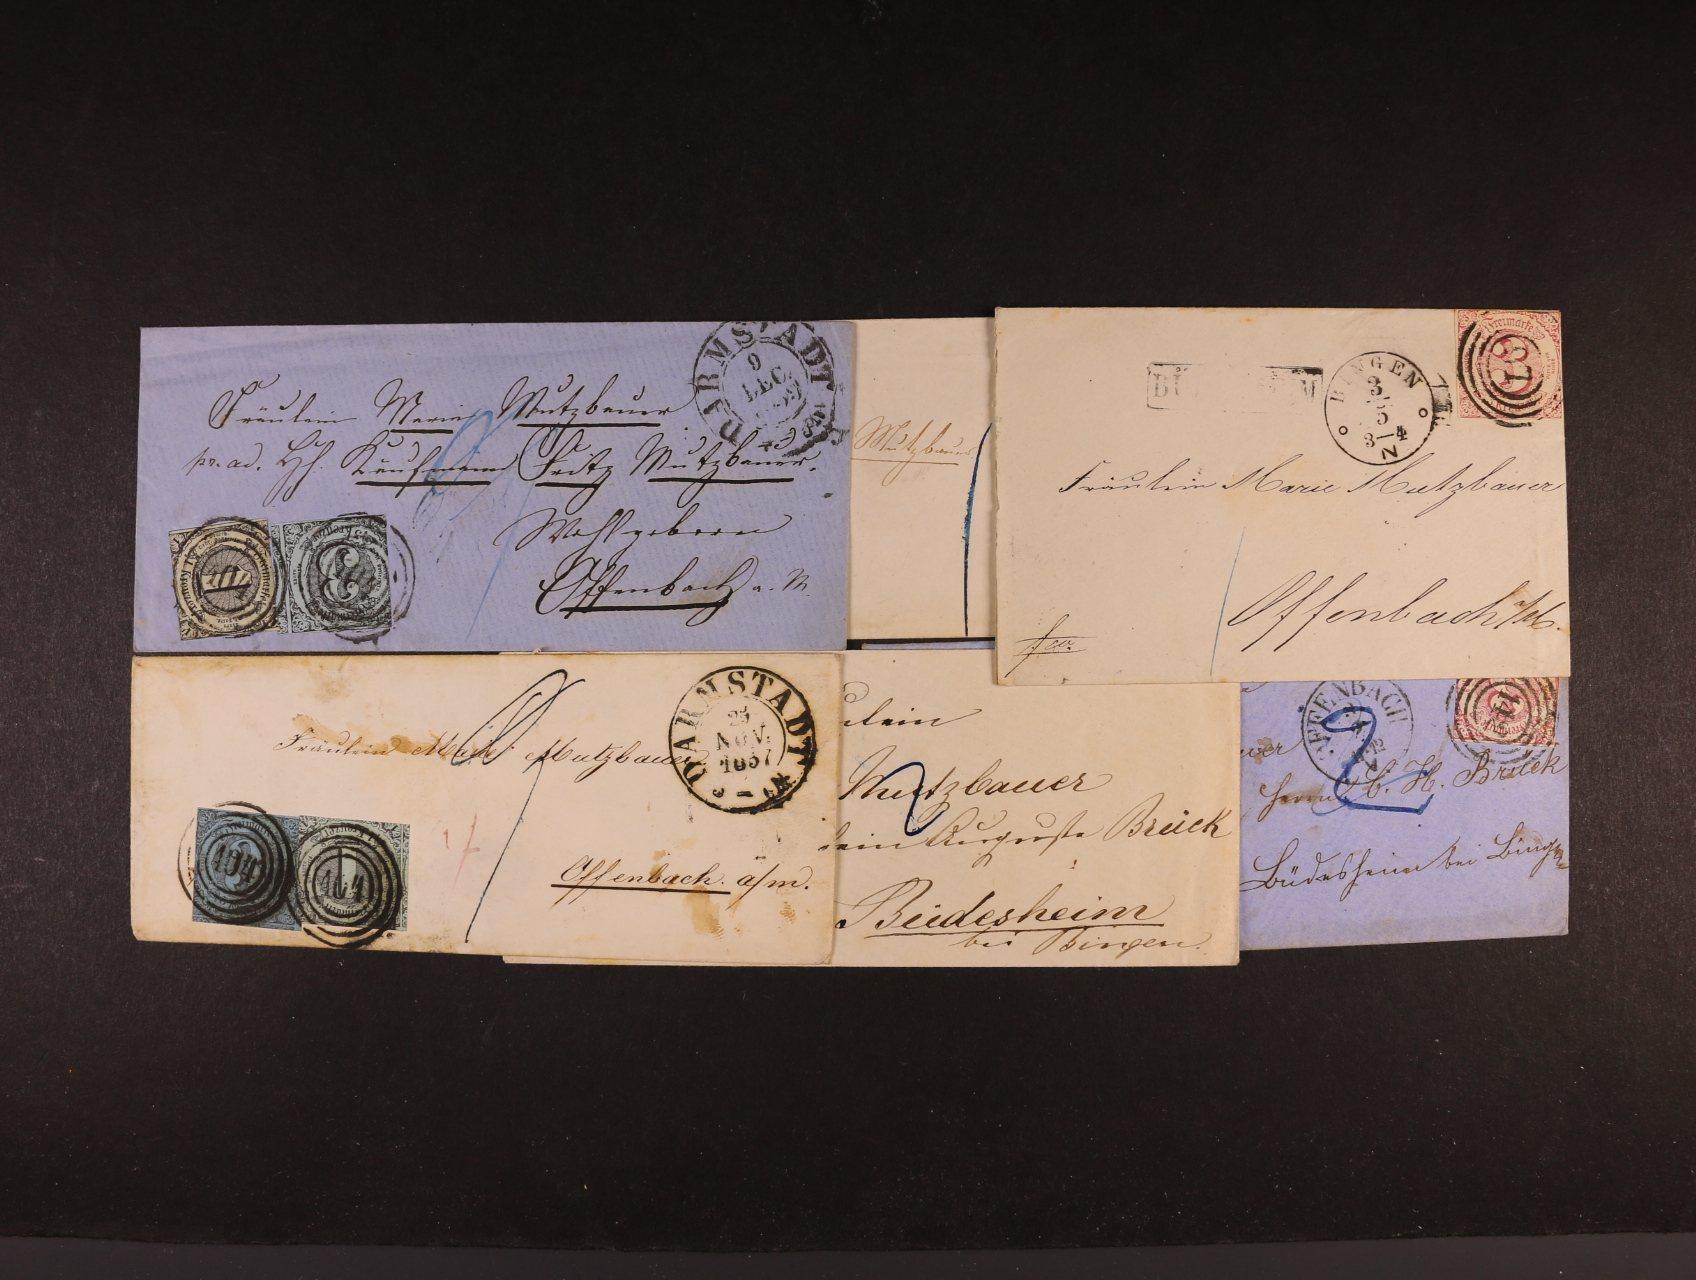 Thurn Taxis - dopis frank. zn. Mi. č. 4 + 6, čís. raz. 104 a denním raz. DARMSTADT 9.DEC.1859, dopis frank. zn. Mi. č. 7 + 8, čís. raz. 104 a denní raz. DARMSTADT 25.NOV.1857, 8 ks dopisů frank. zn. Mi. č. 6 s různými číselnými a denními raz., min. 700 EUR